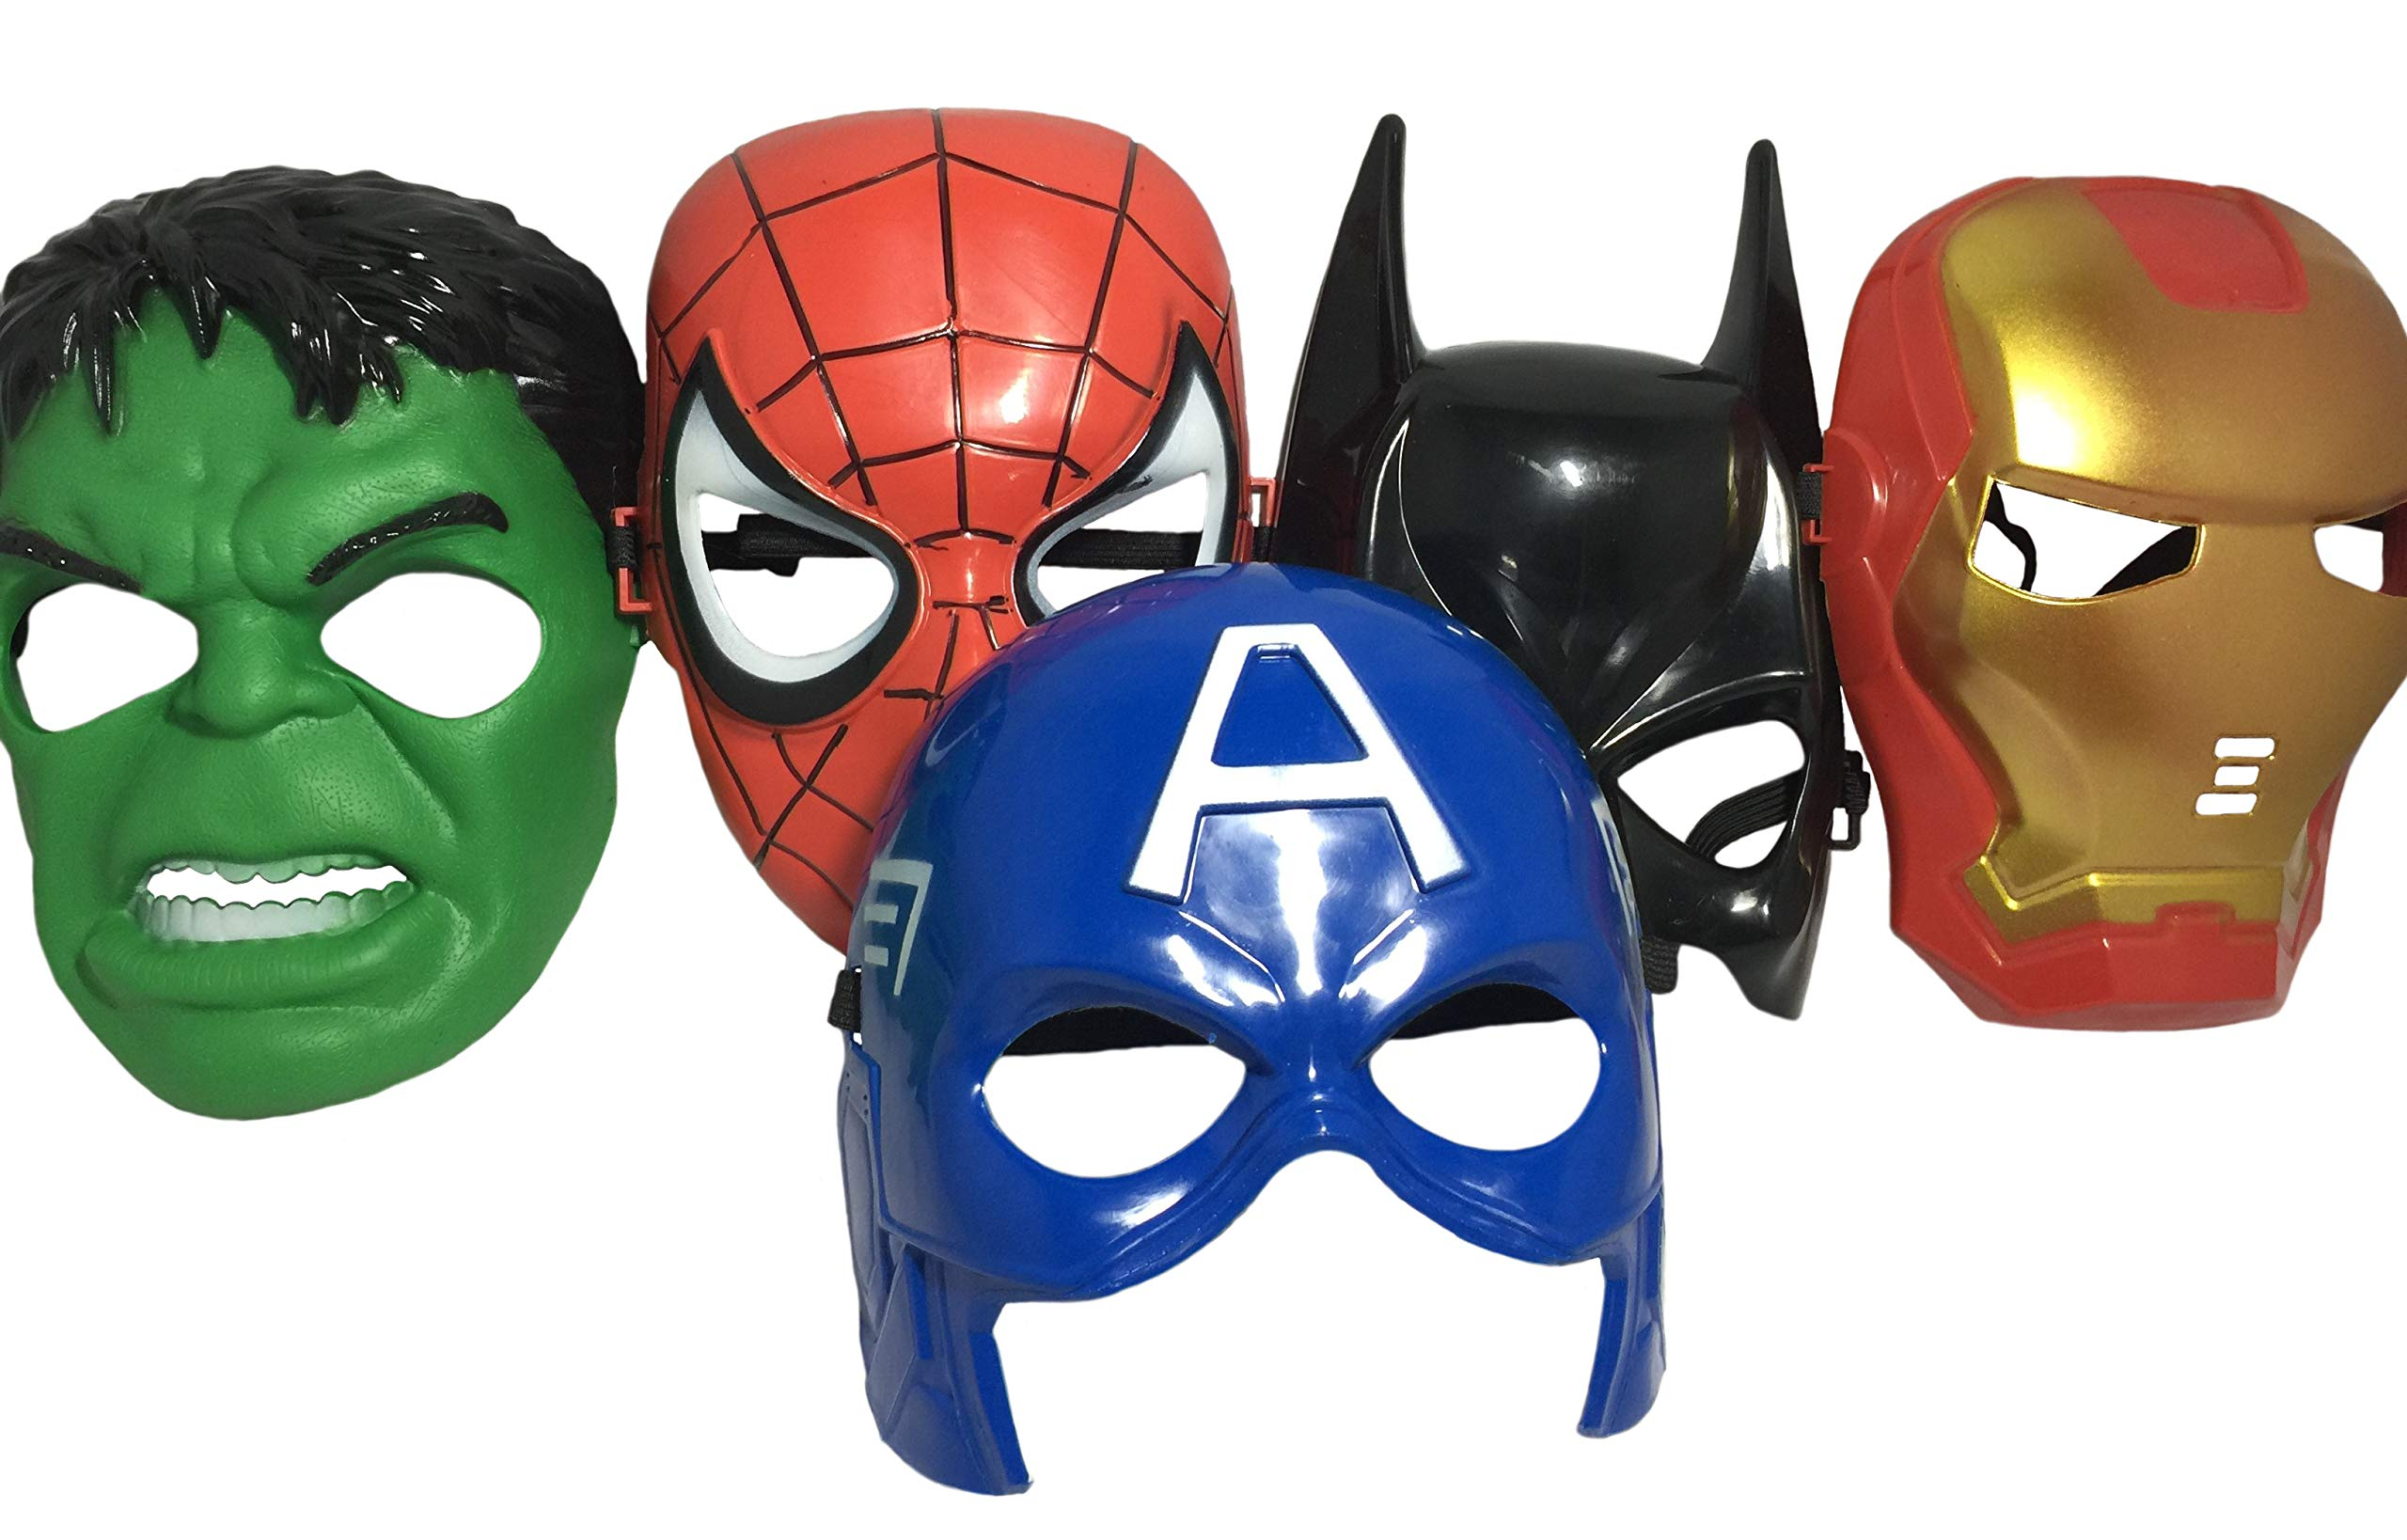 Seasons Merchandise Set Of 5 Masks: Spider-Man, Batman, Hulk, Iron man, Captain America by Seasons Merchandise